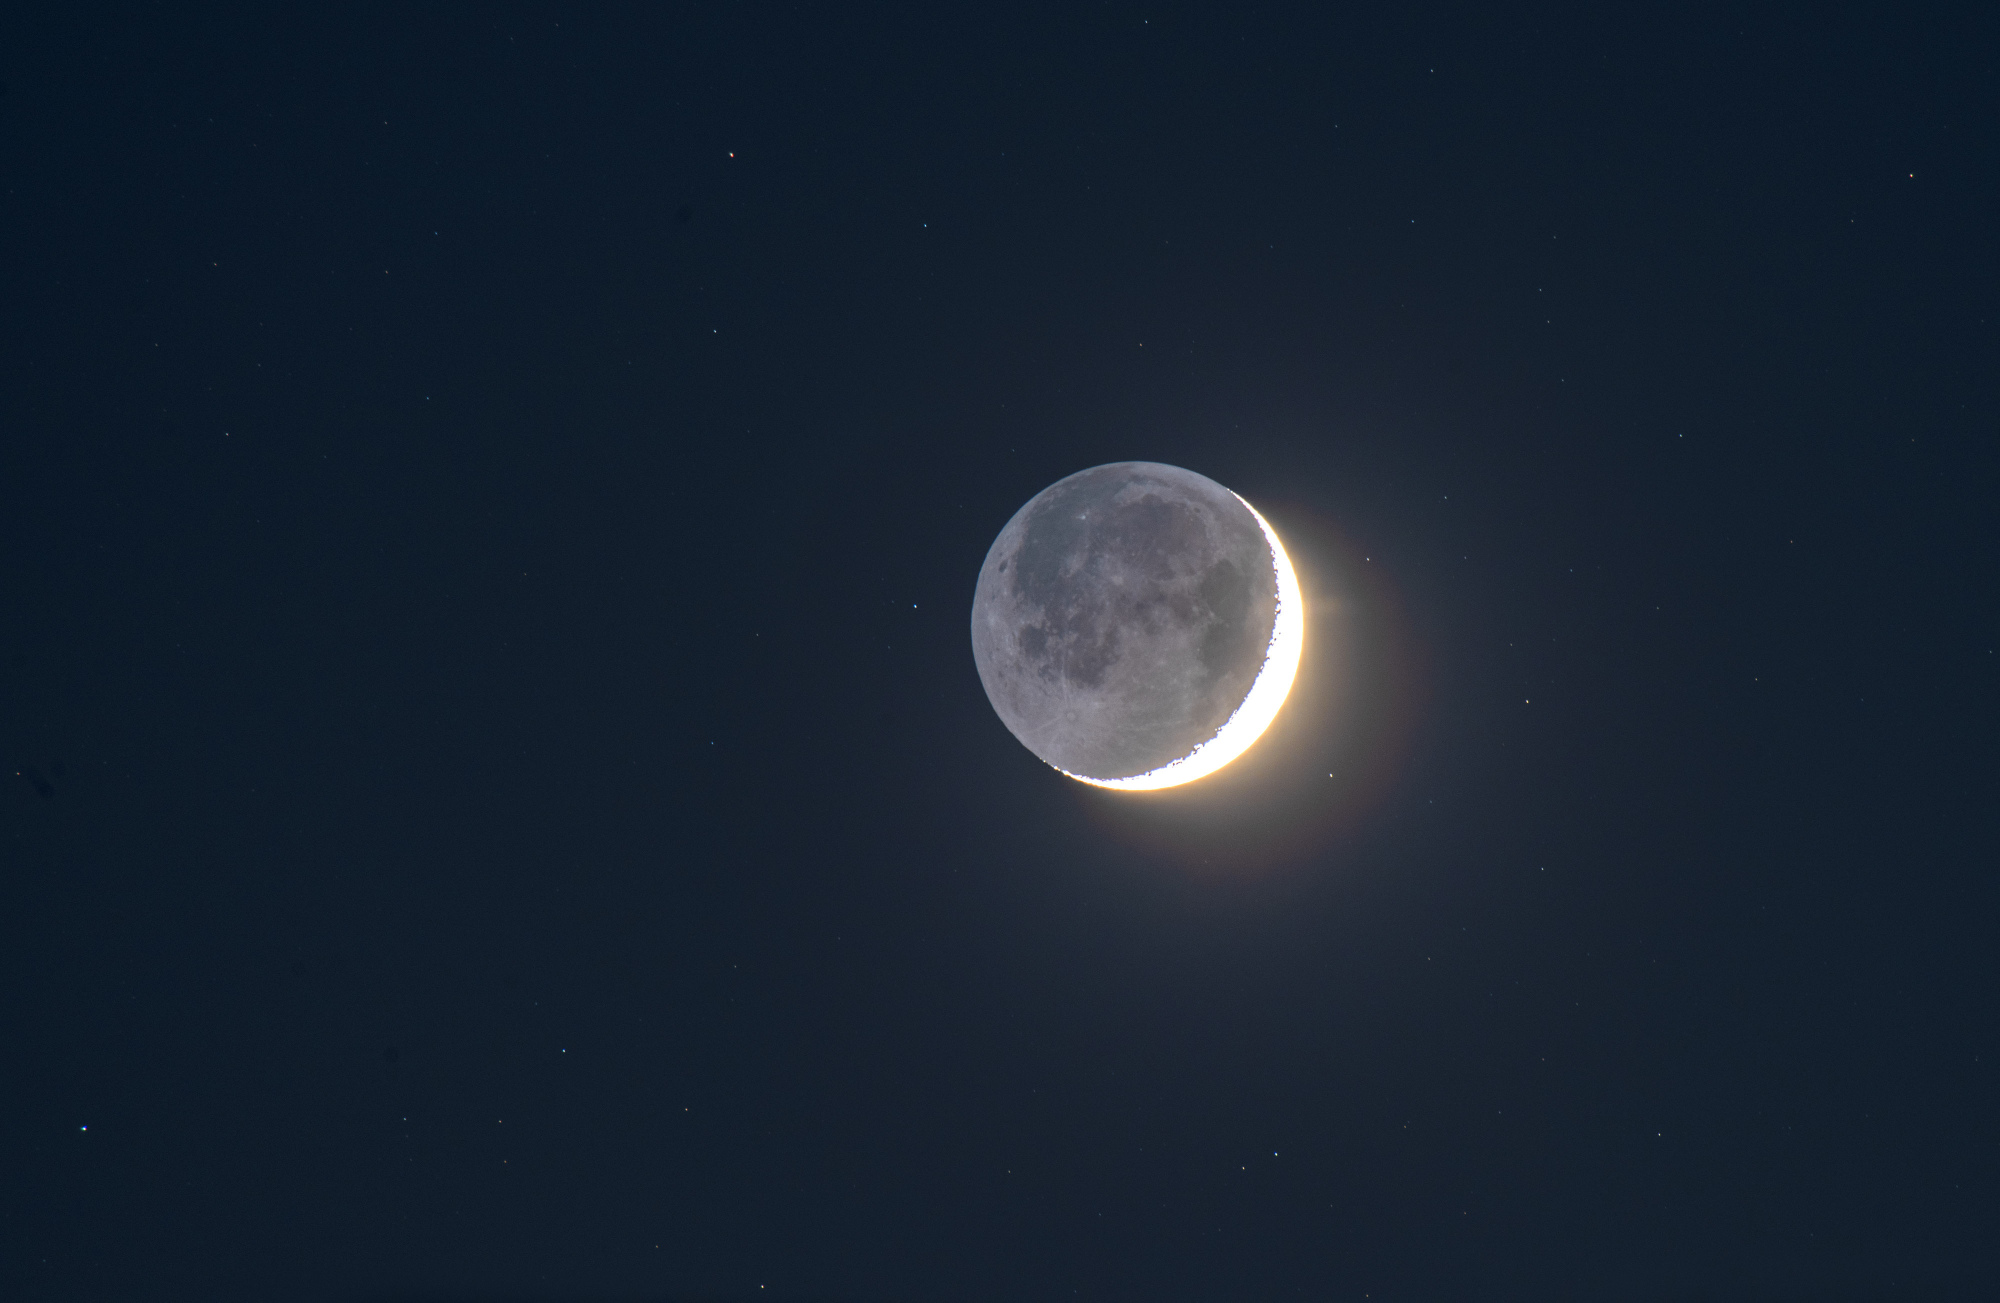 Lune cendree 15 secondes.jpg